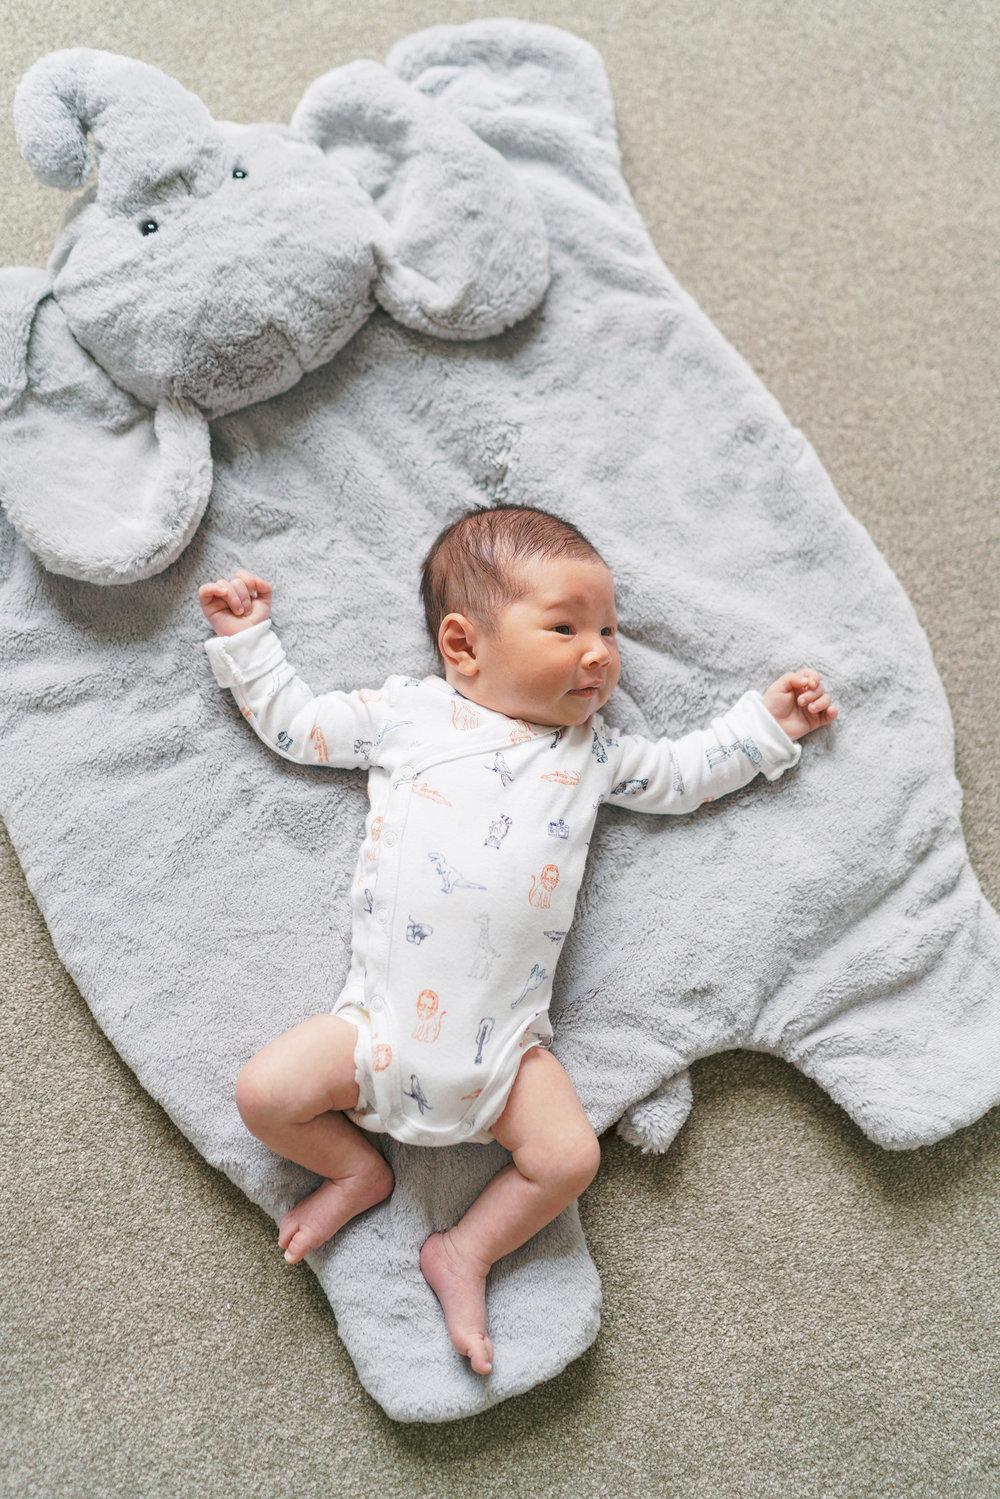 hannah-cochran-photography-tyle-newborn-02705.jpg